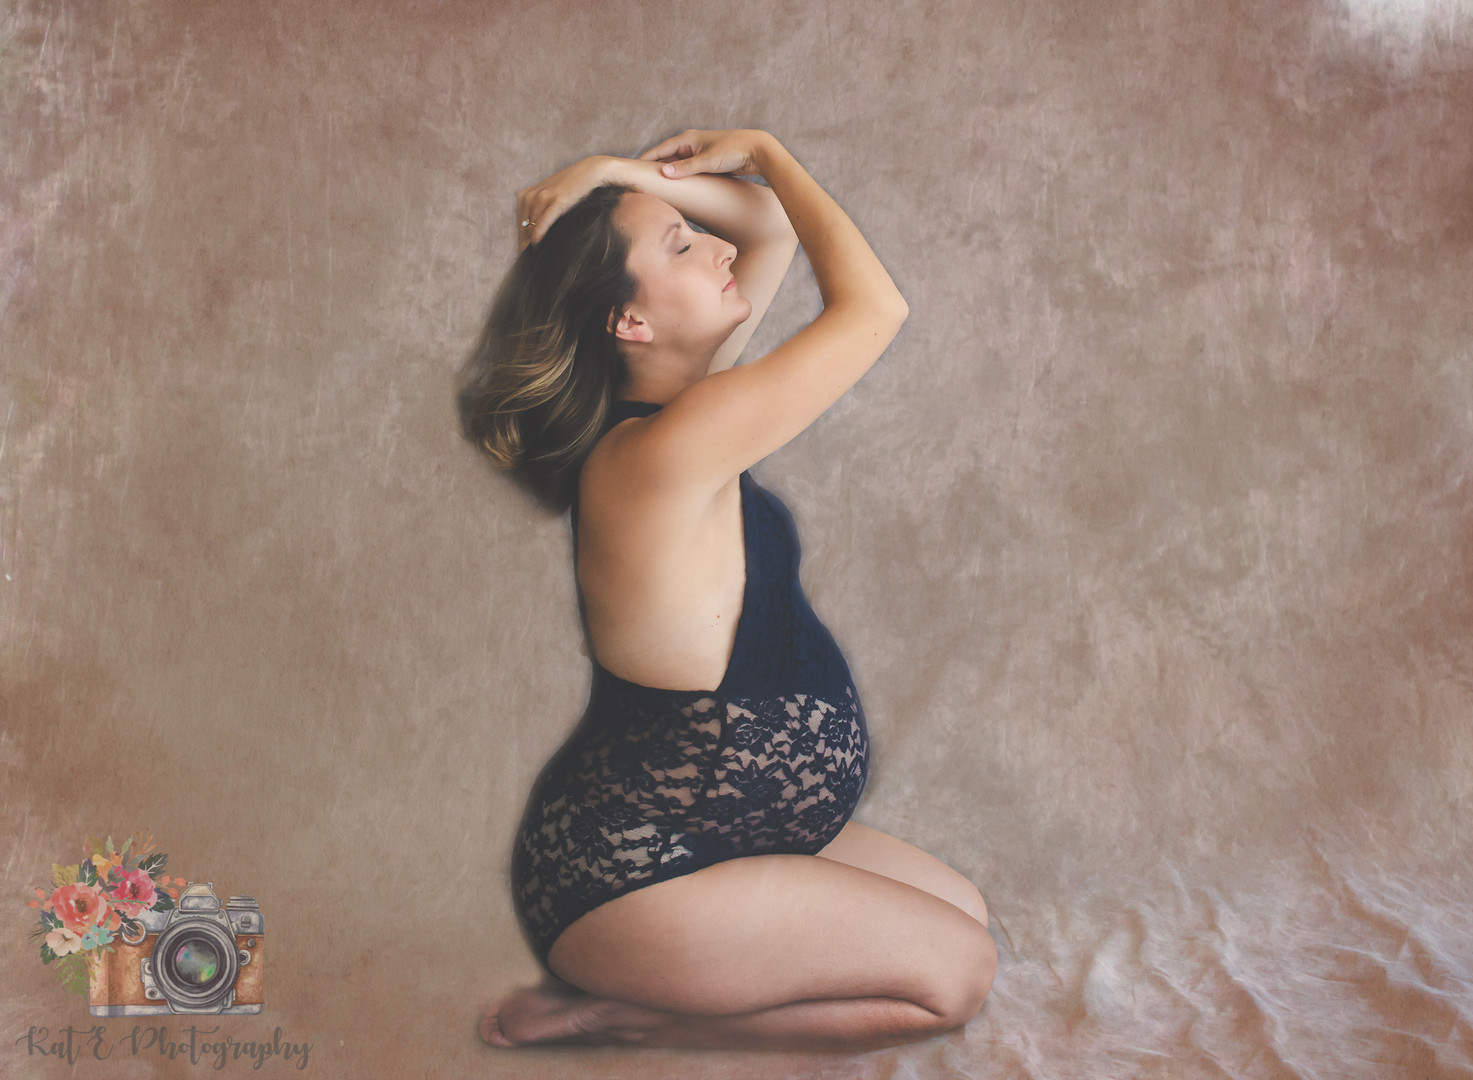 In studio maternity cypress, tx